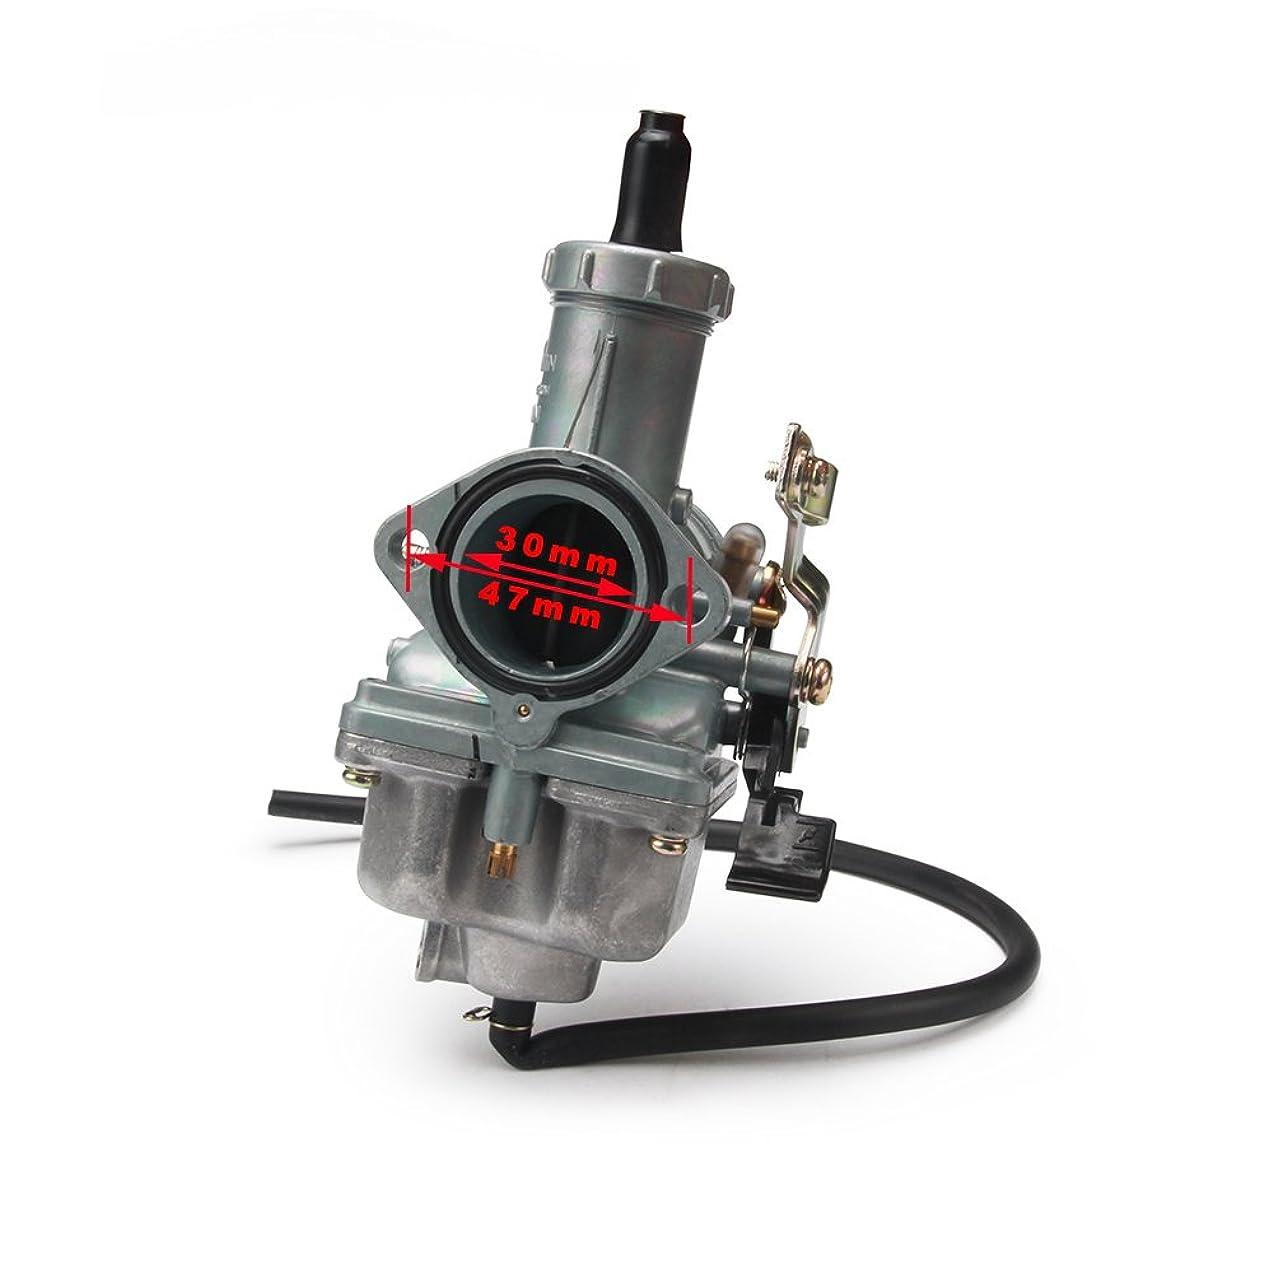 Cable Choke PZ30 30mm Carb Carburetor For Motorcycle 200CC 250CC Dirt Bike ATV Quad tao tao